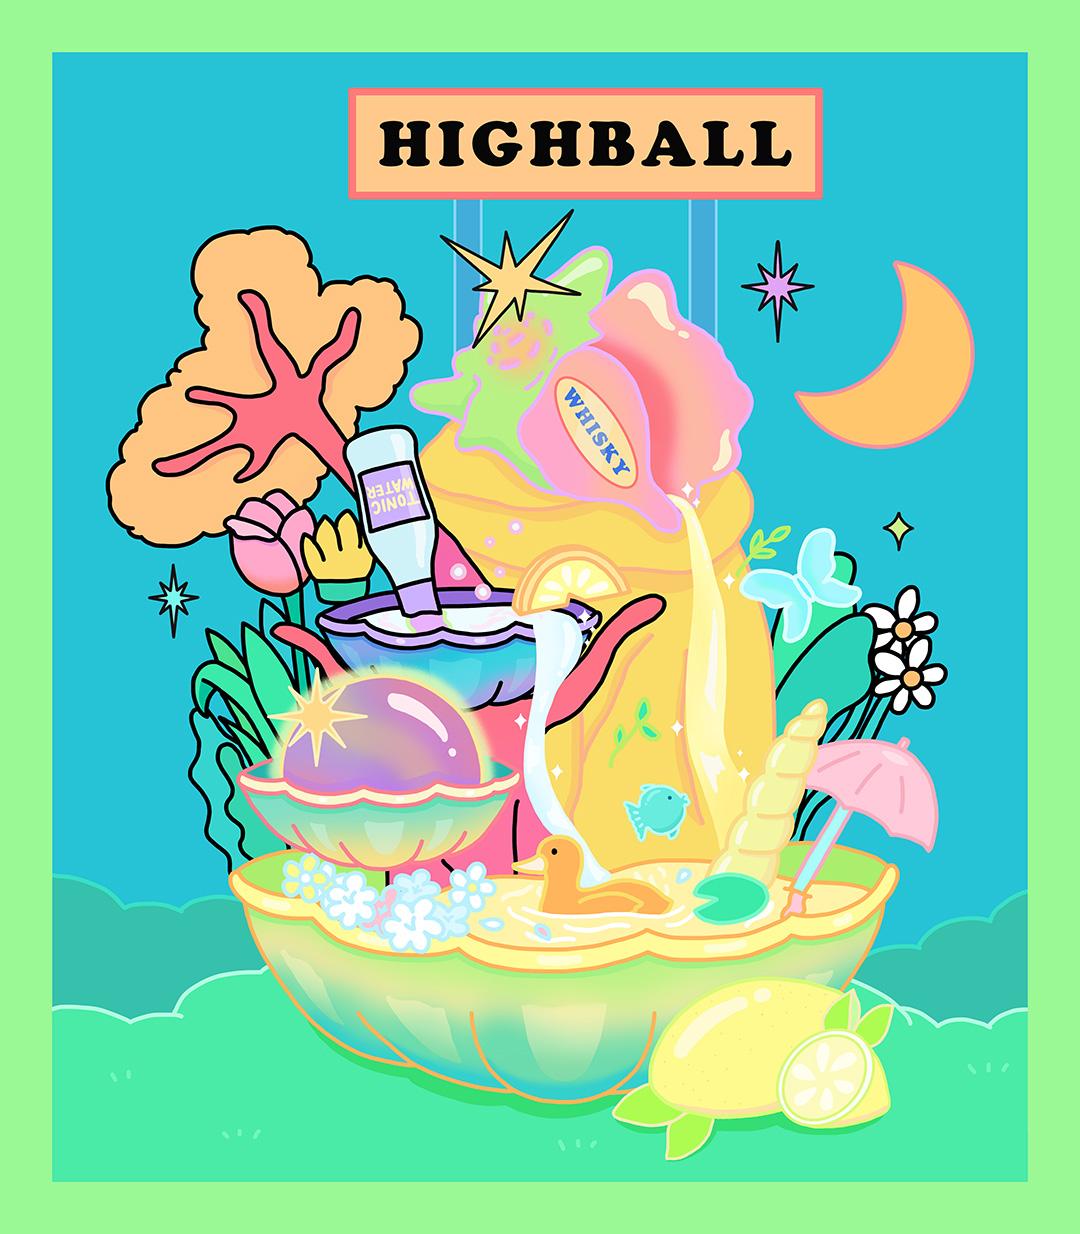 Girlsclub-Asia-Haein Jeong-highball